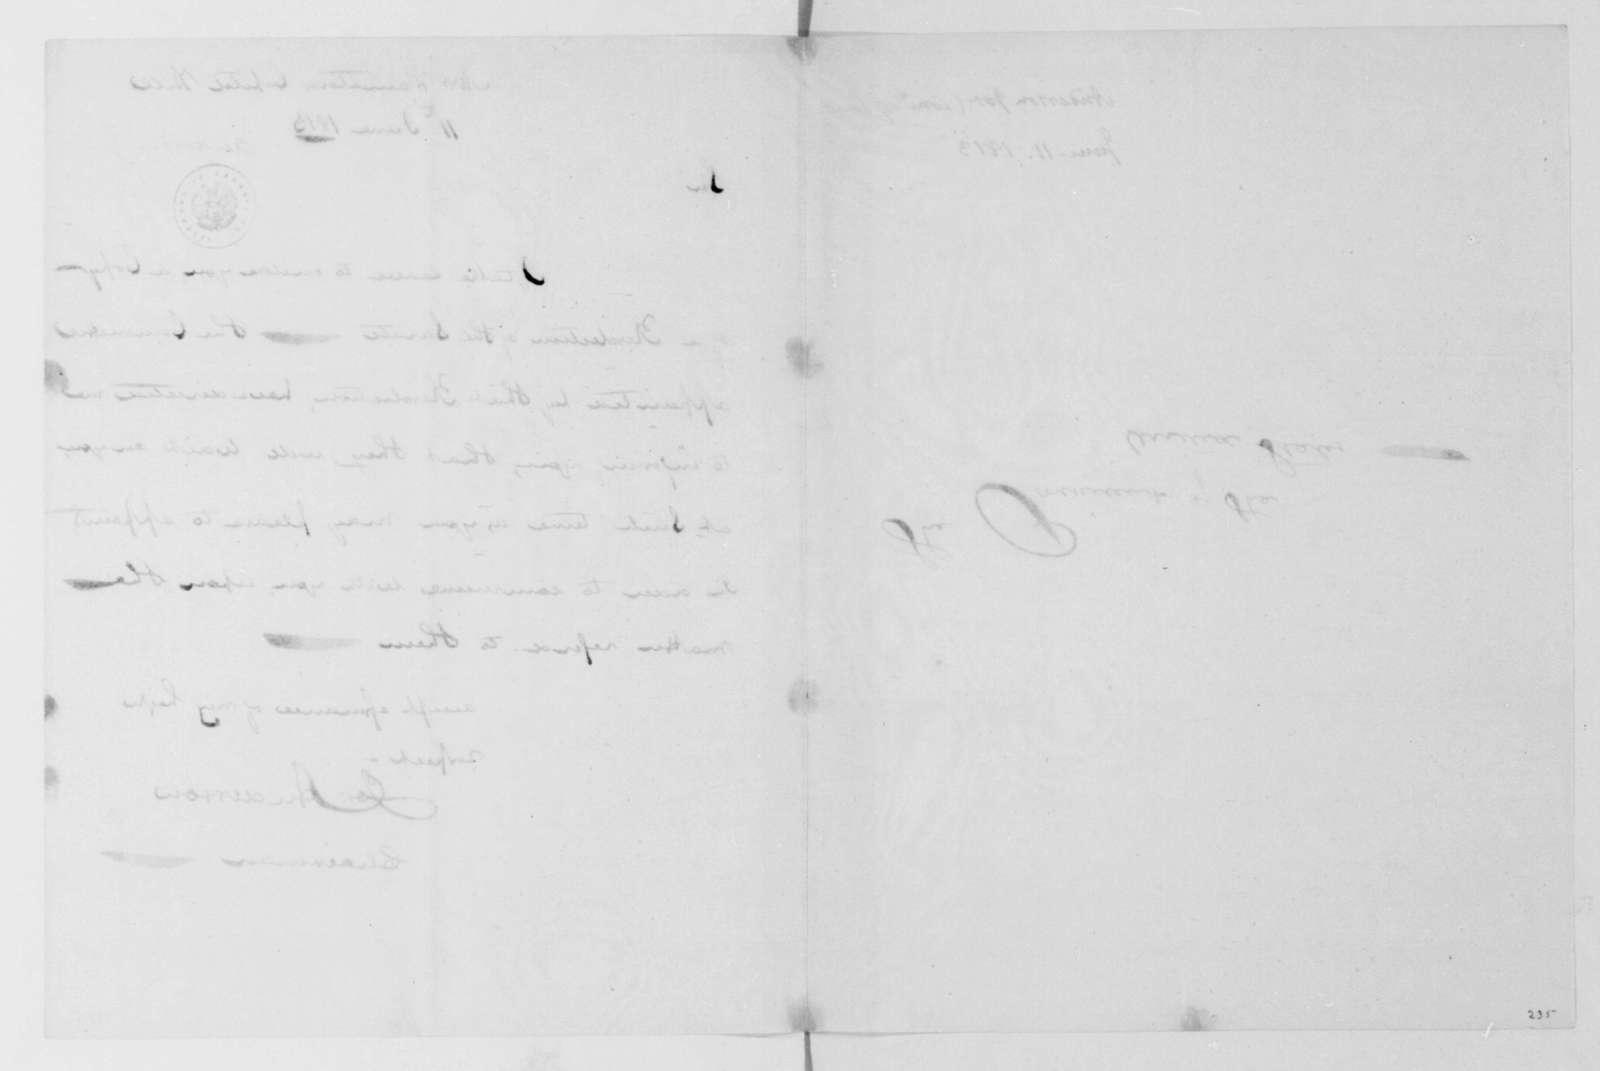 Joseph Anderson to James Madison, June 11, 1813.